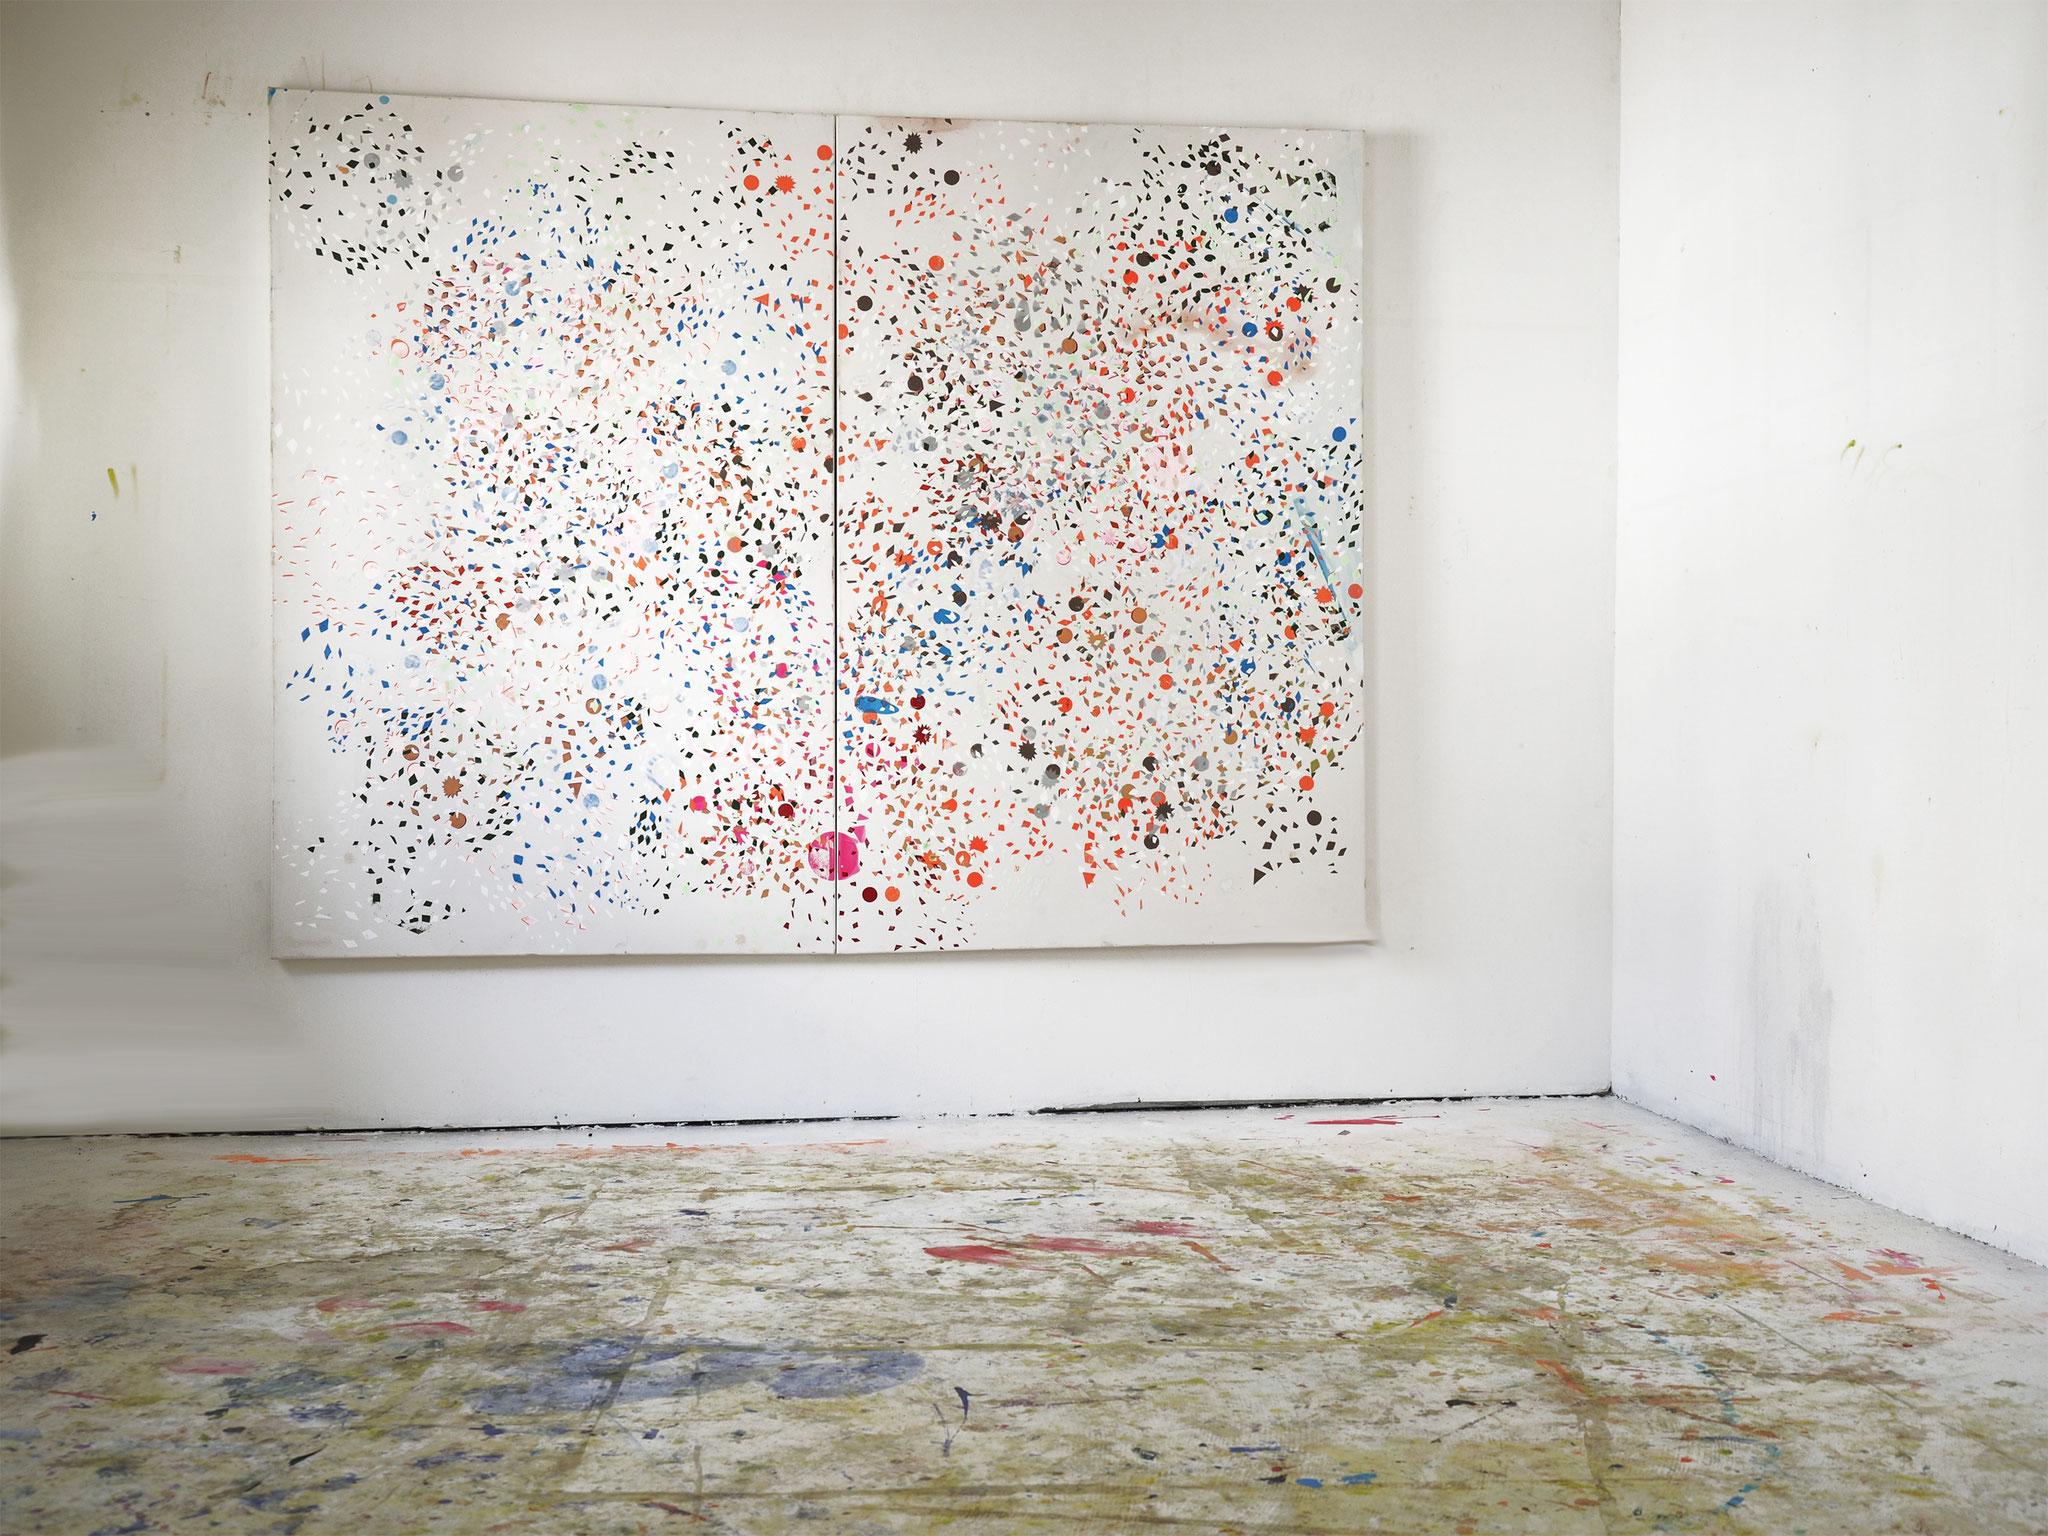 """Lazarus (Dawid Bowie), 2 x 110 x 1m, Acryl auf Leinwand, Atelieransicht, Foto: Ralf Timm,"